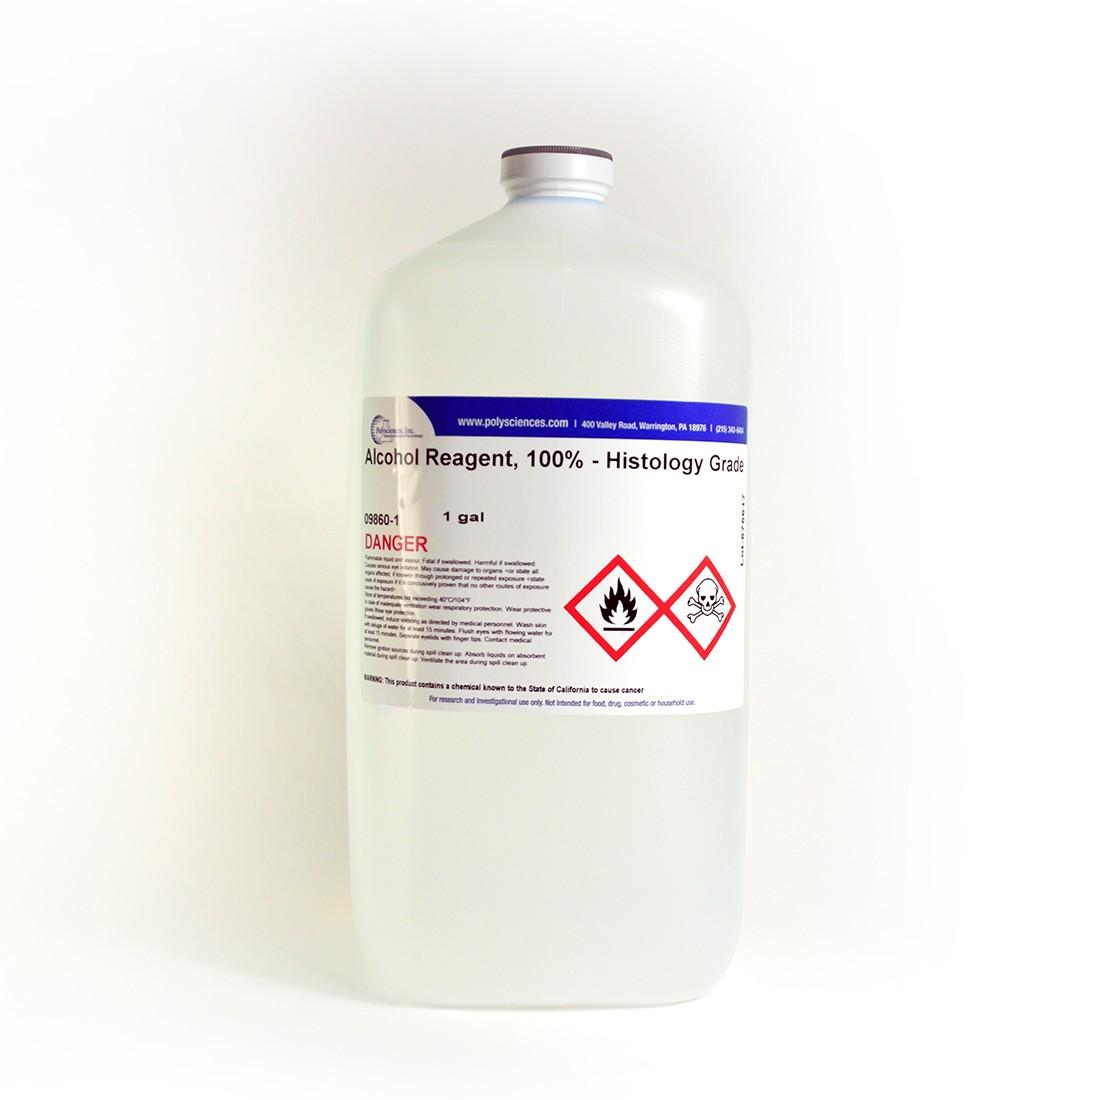 Alcohol Reagent, 100% - Histology Grade | Polysciences, Inc